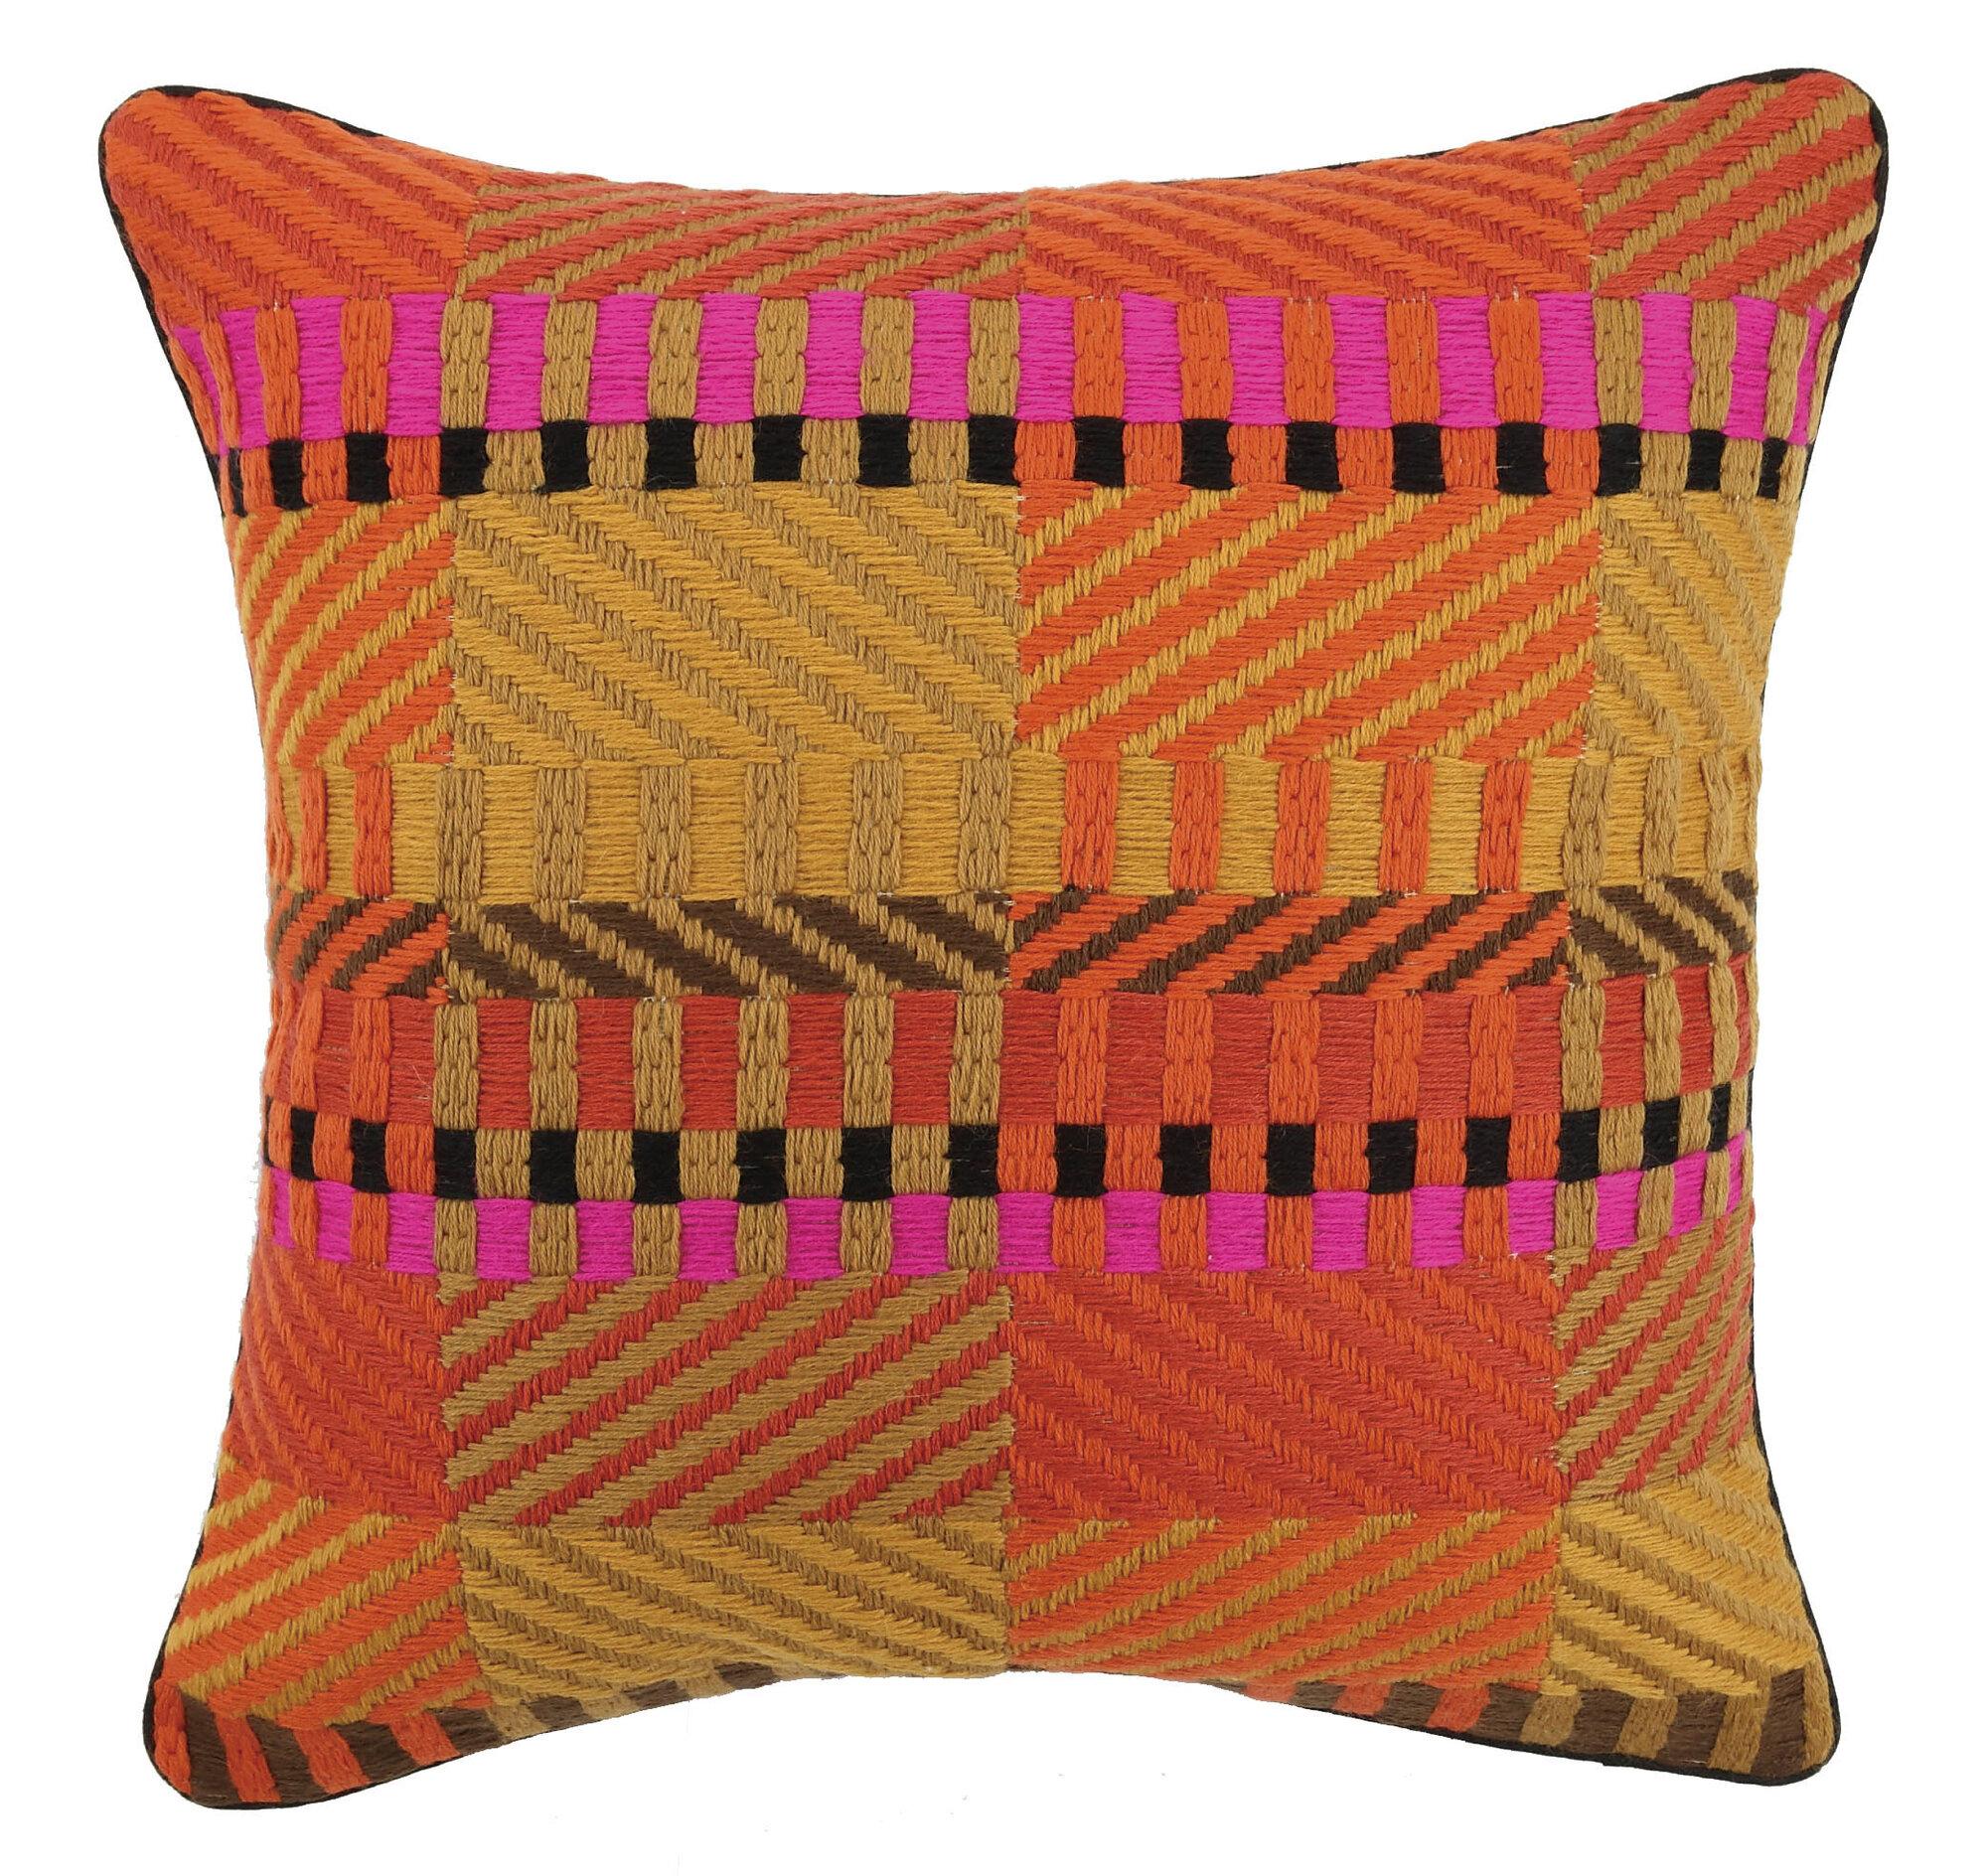 Decorative Pillows Trina Turk : Trina Turk Residential Vintage Weave Needlepoint Linen Throw Pillow eBay